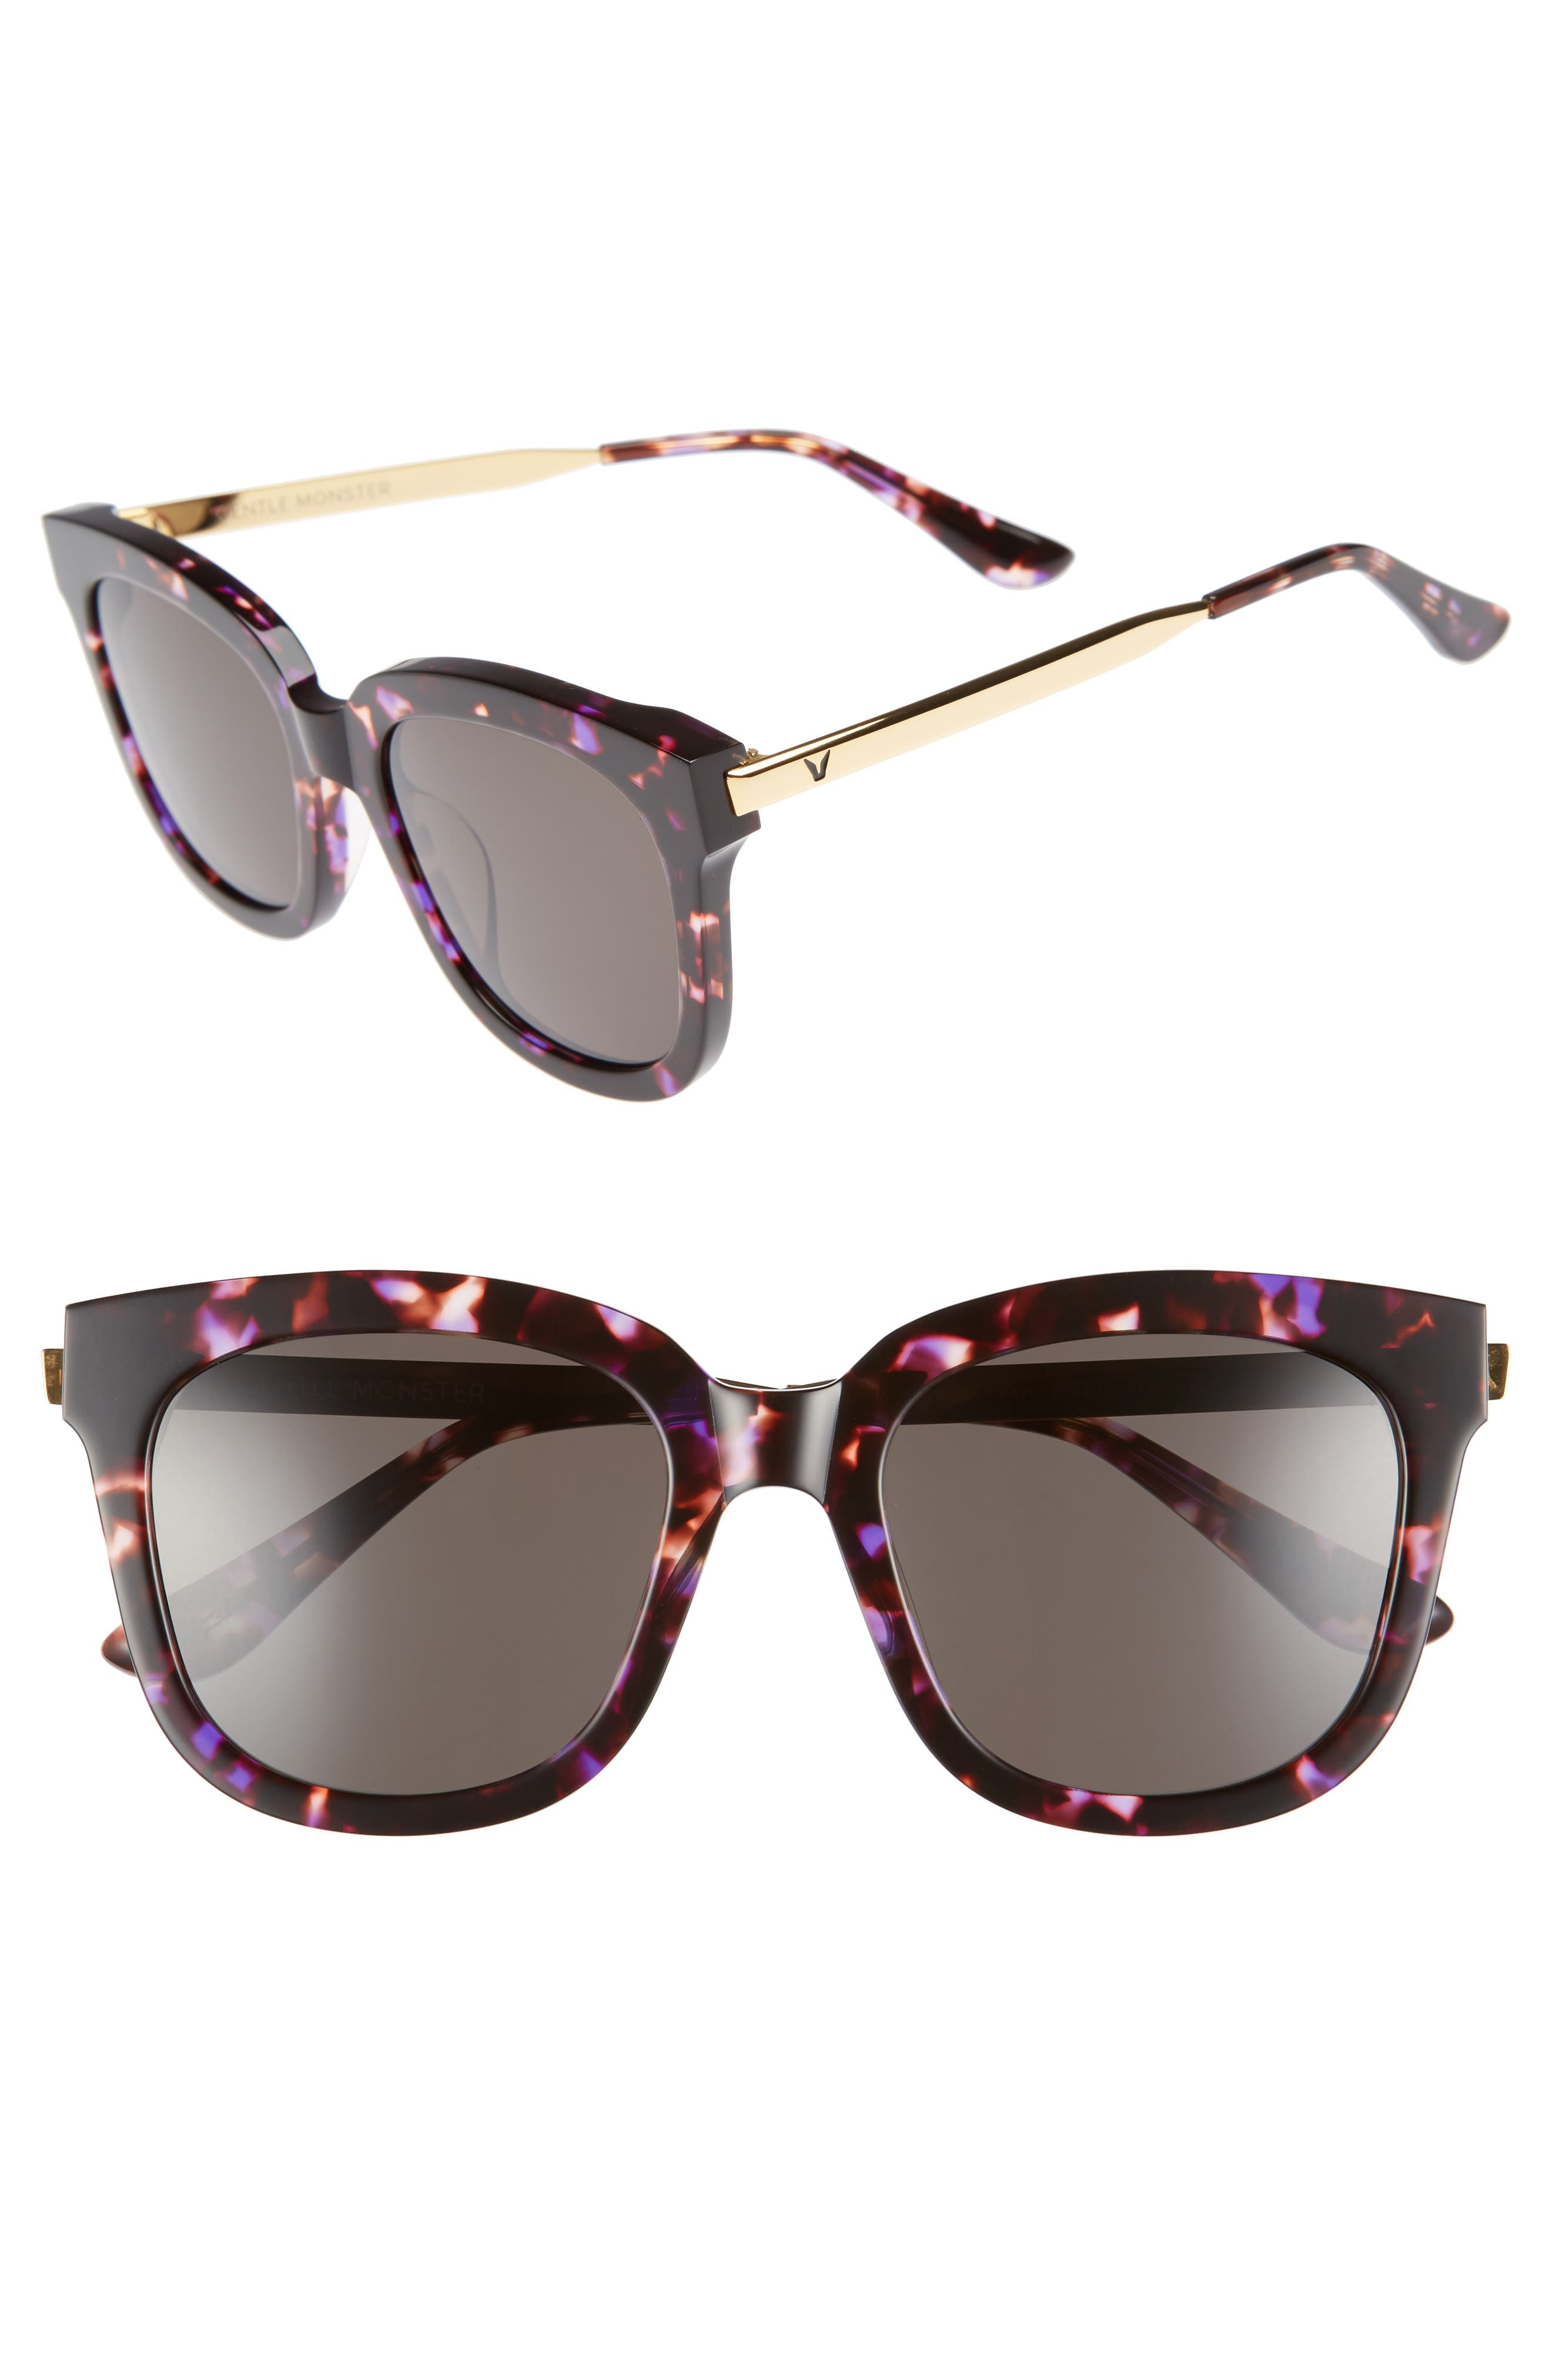 GENTLE MONSTER Absente 54mm Zeiss Lens Sunglasses